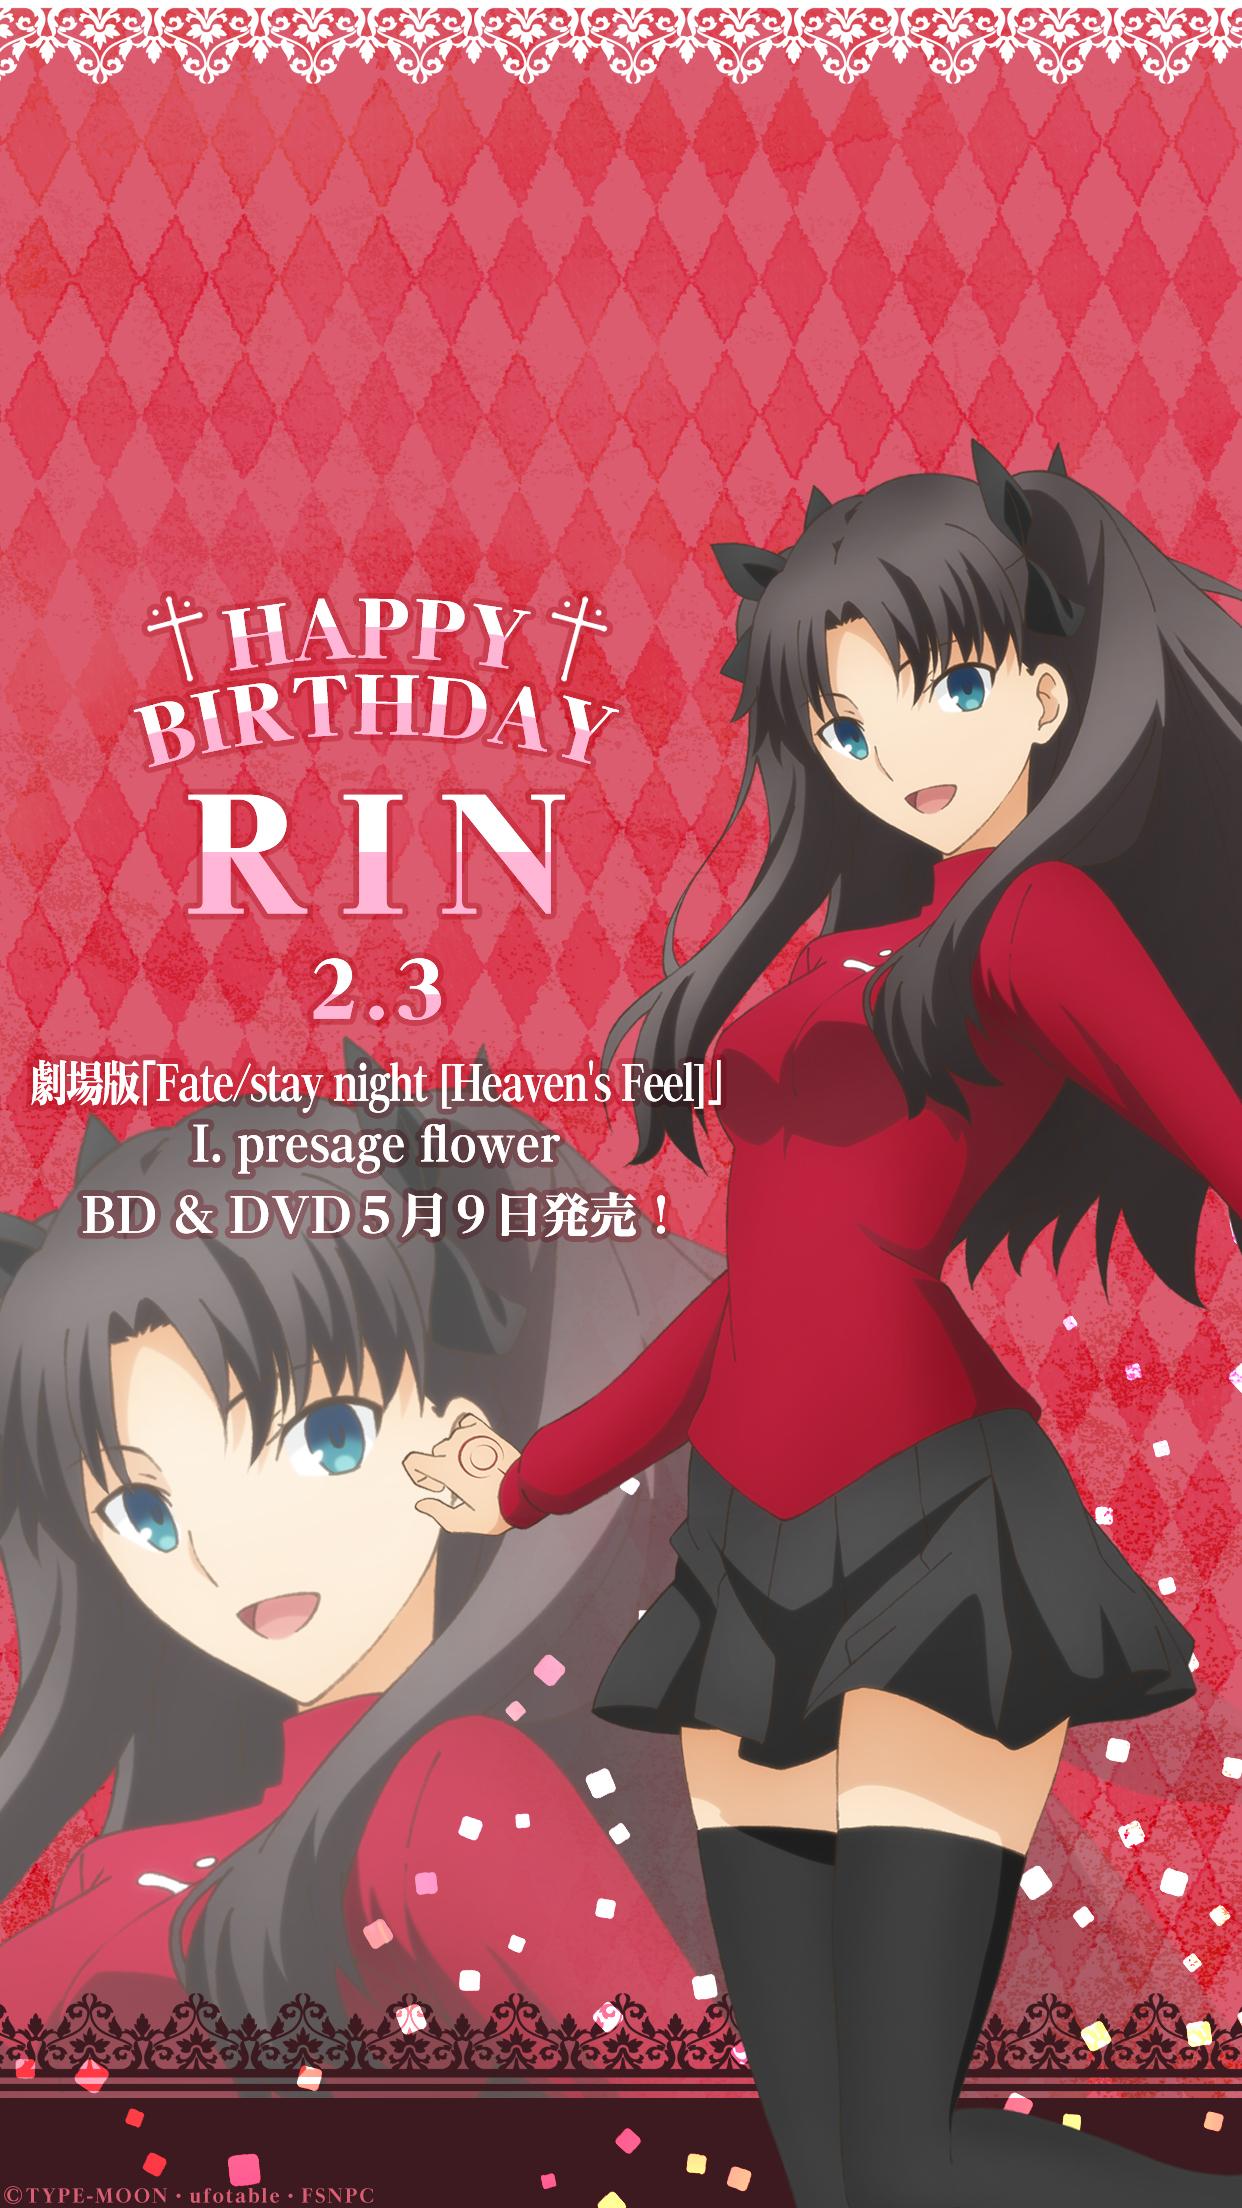 Mobile Wallpaper Of Rin Tohsaka Made For Her 2018 Birthday 1242